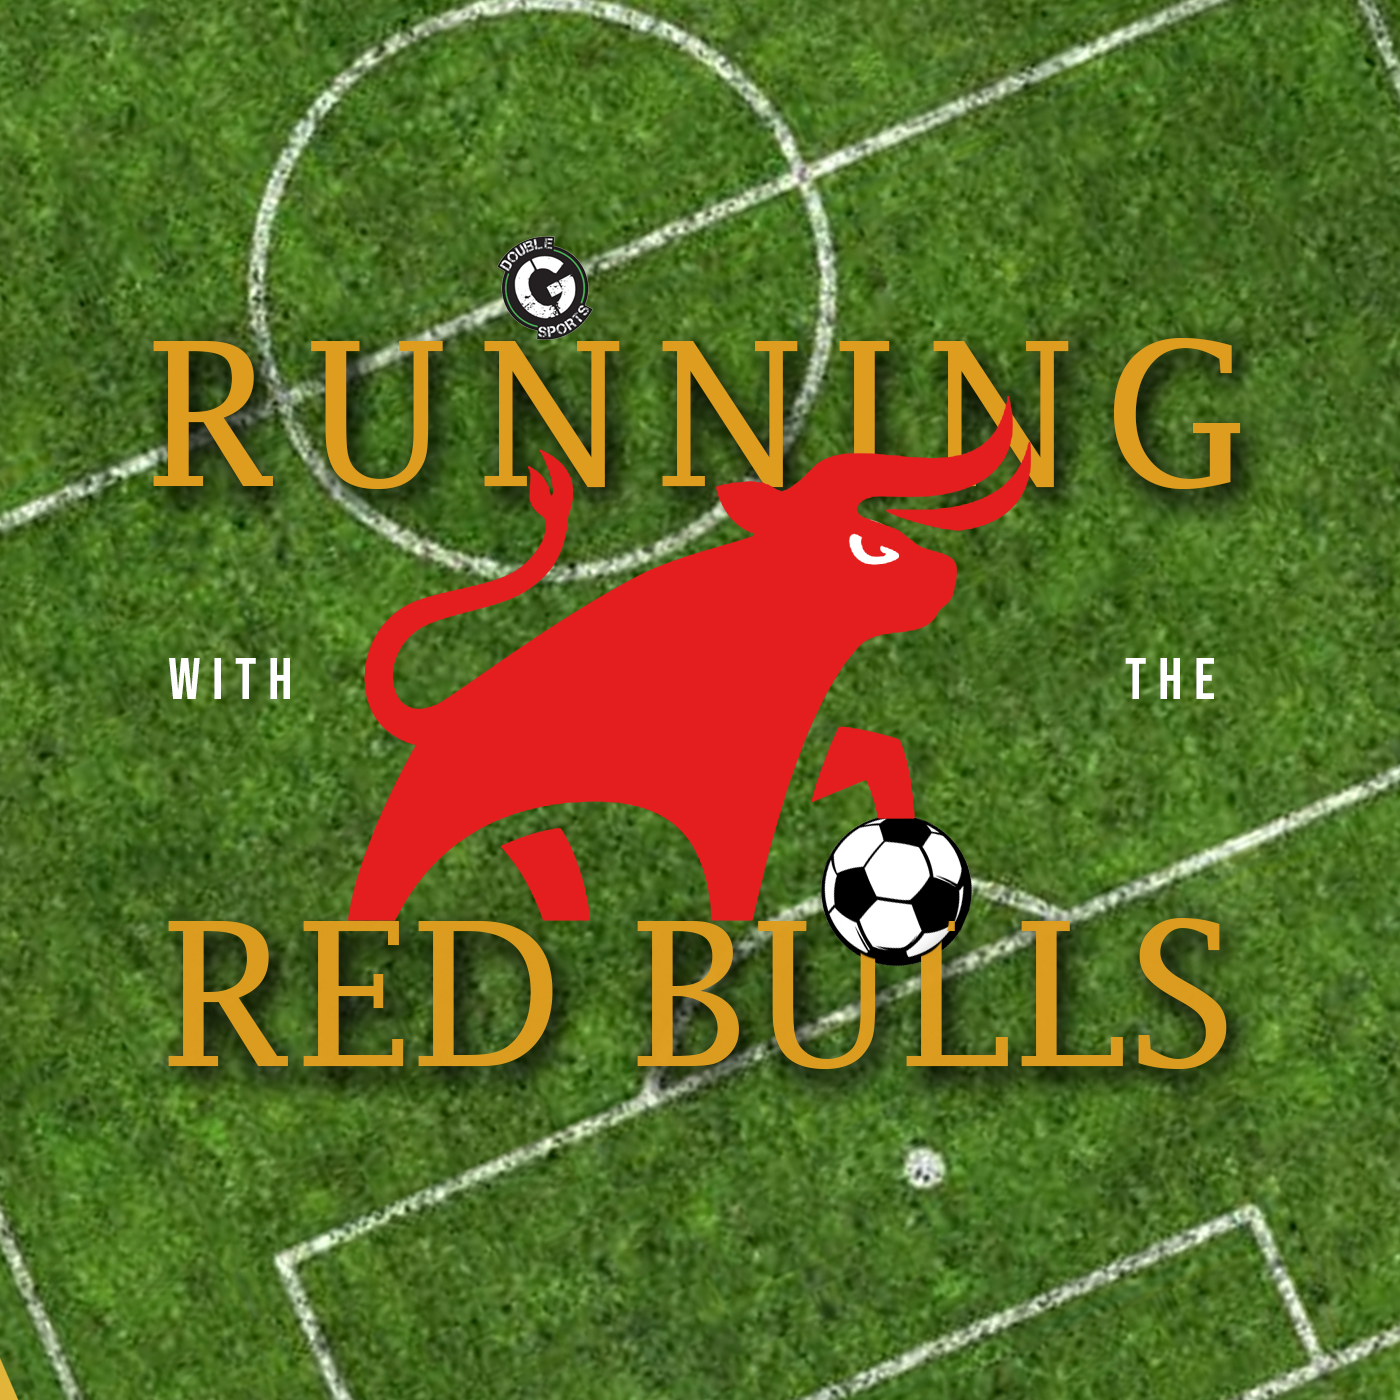 redbulls